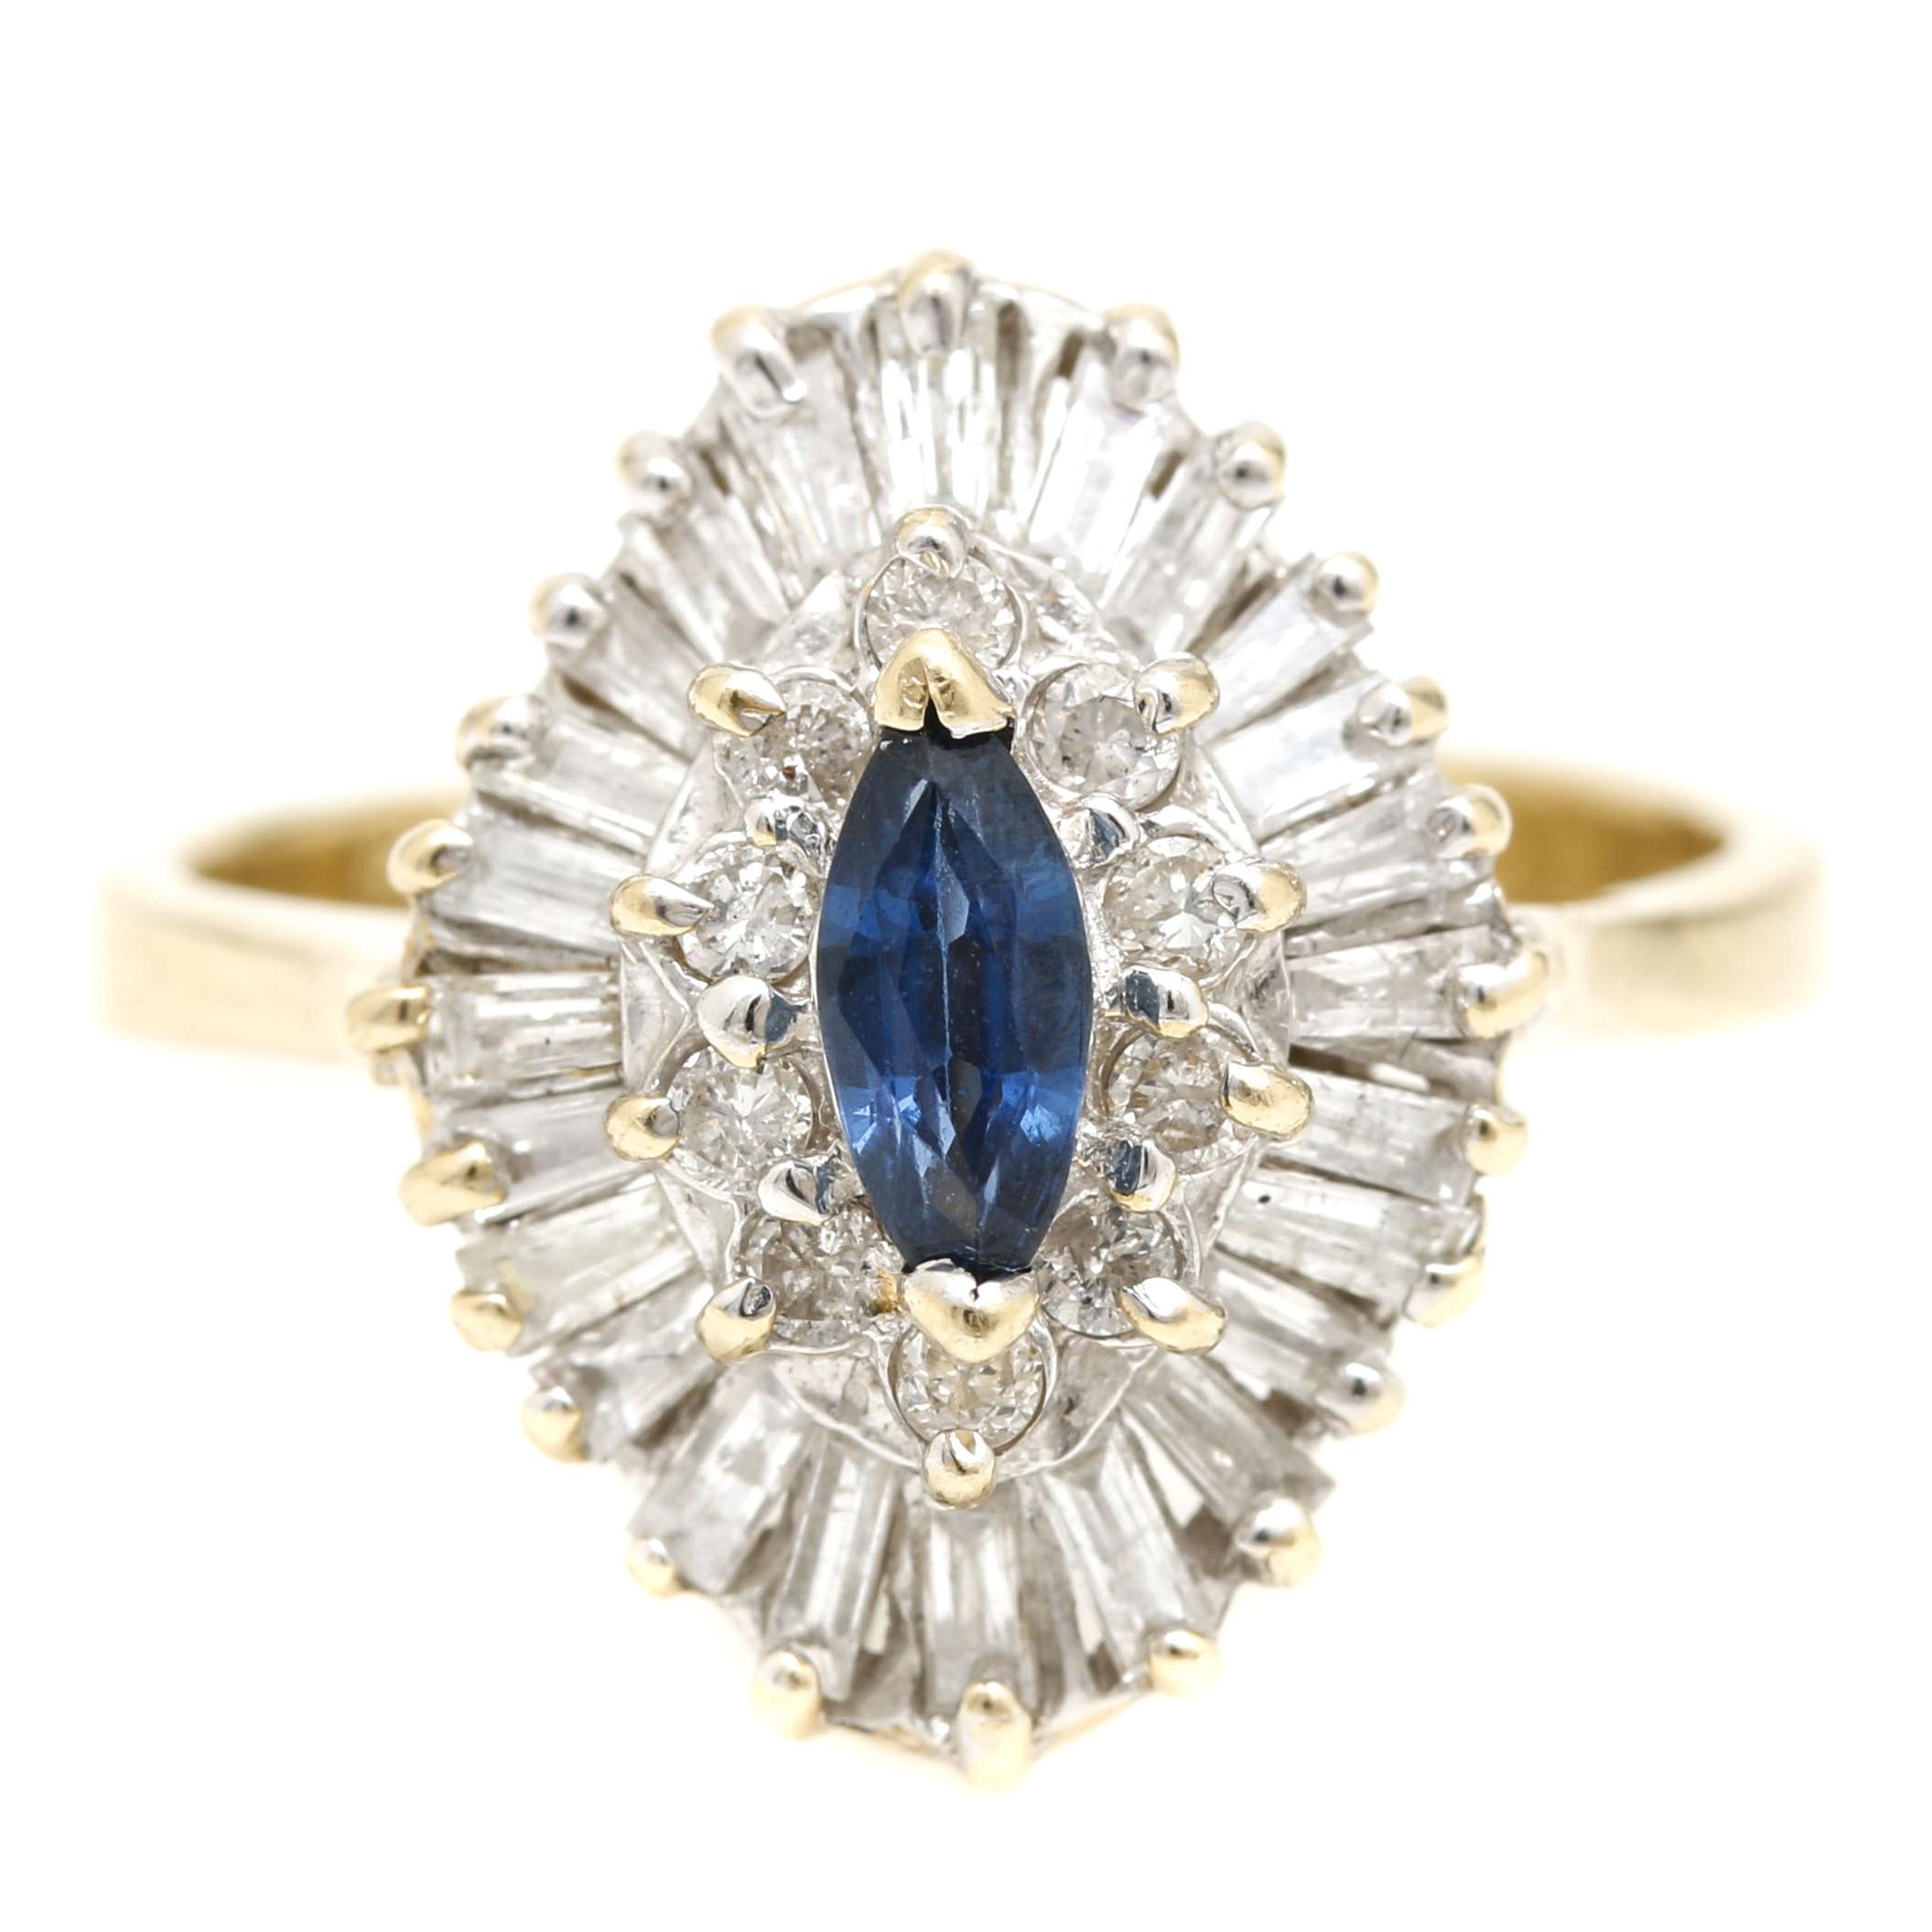 14K Yellow Gold Sapphire and Diamond Ballerina Ring